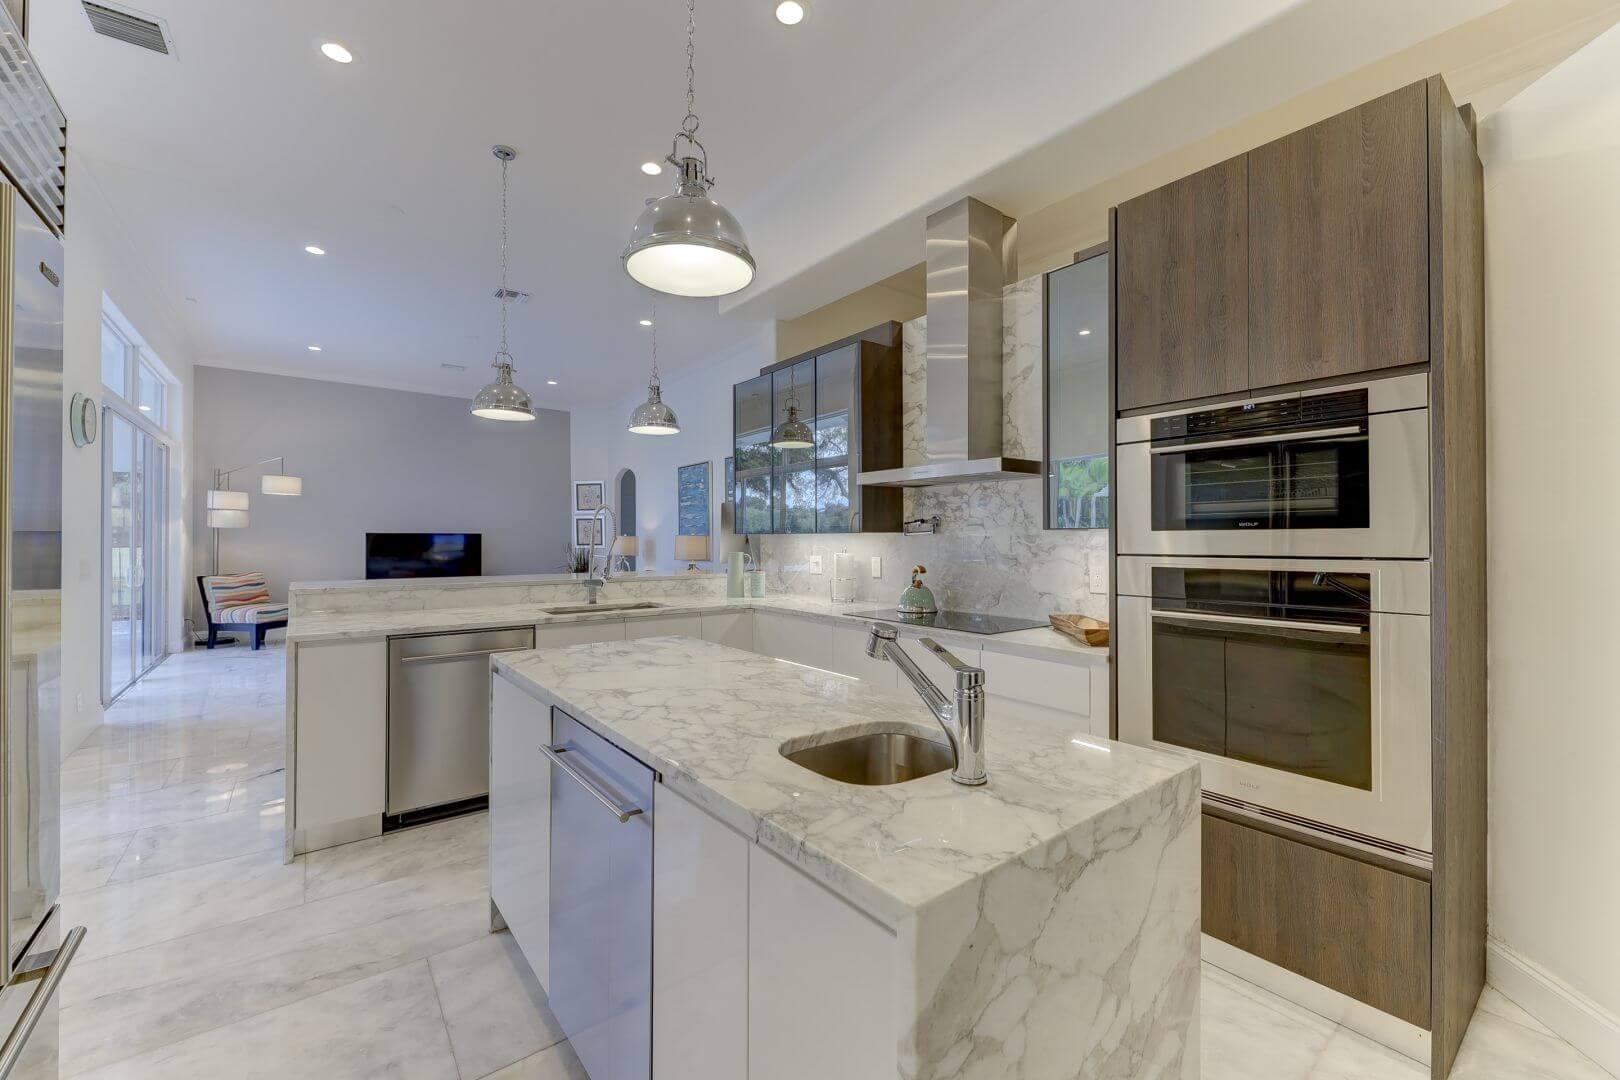 Kitchen-Remodeling-Sk-Stones-usa